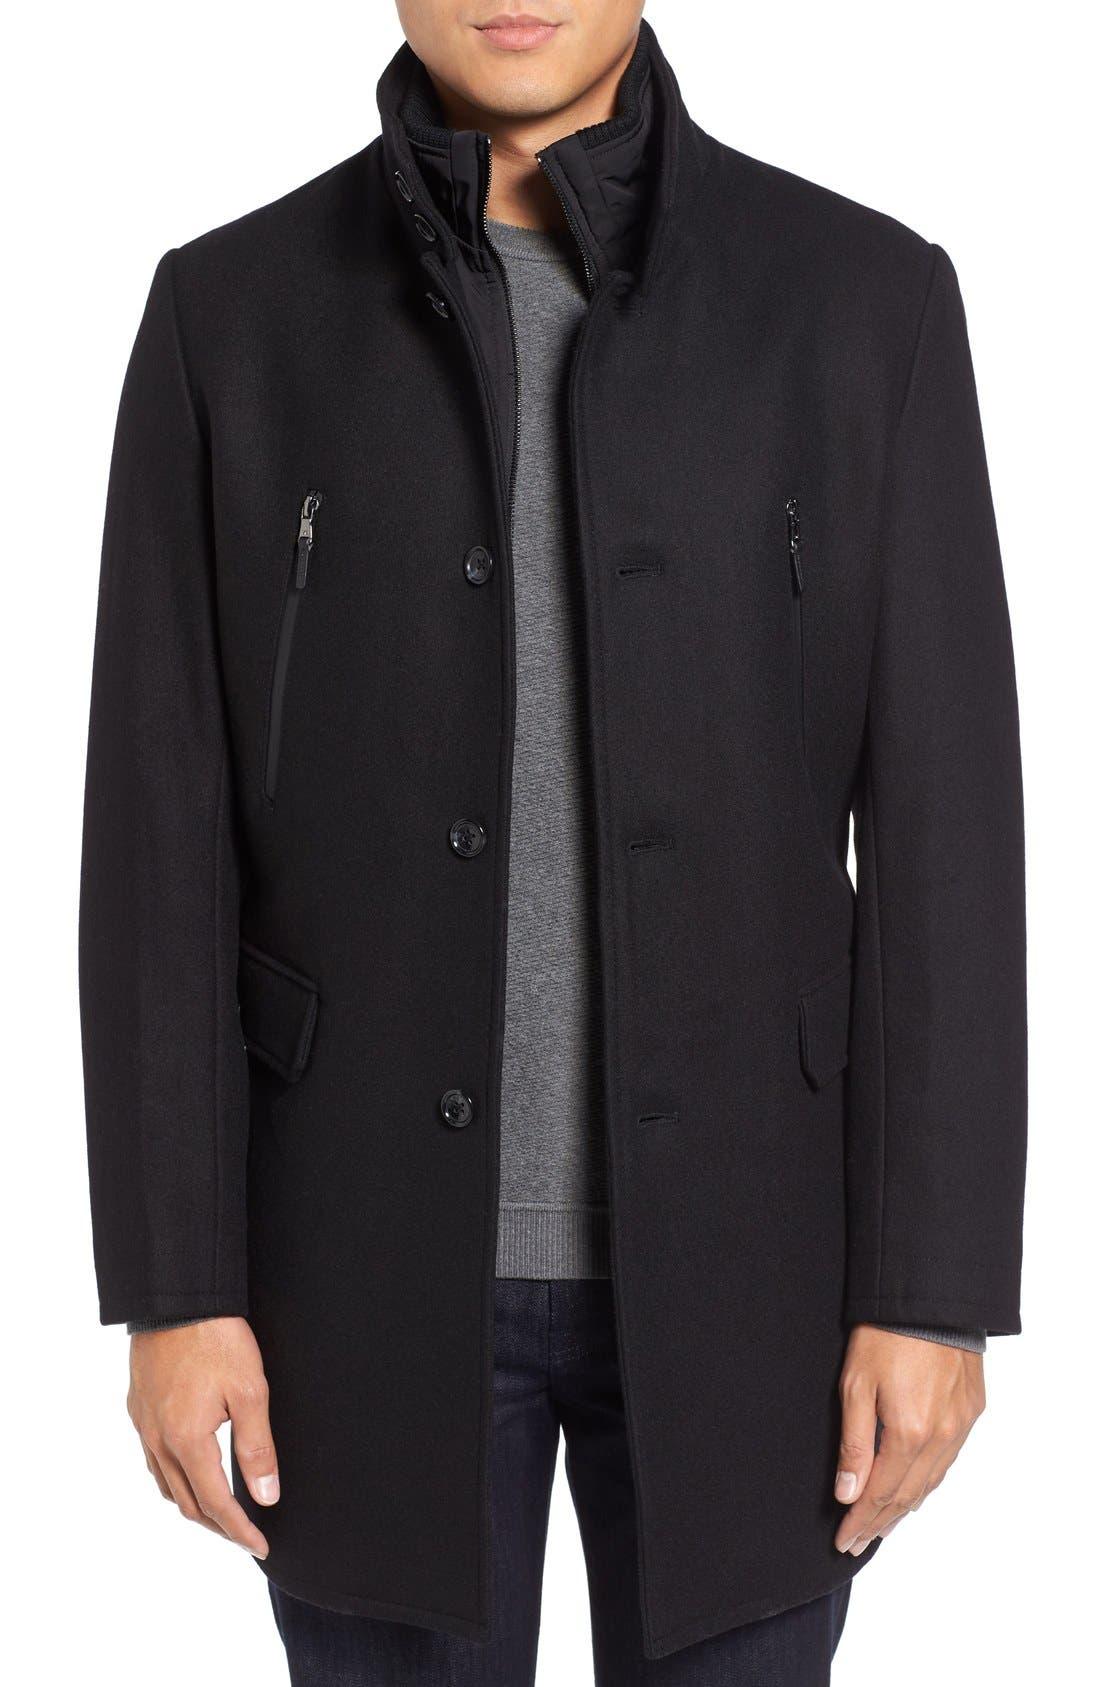 Michael Kors Wool Blend Top Coat